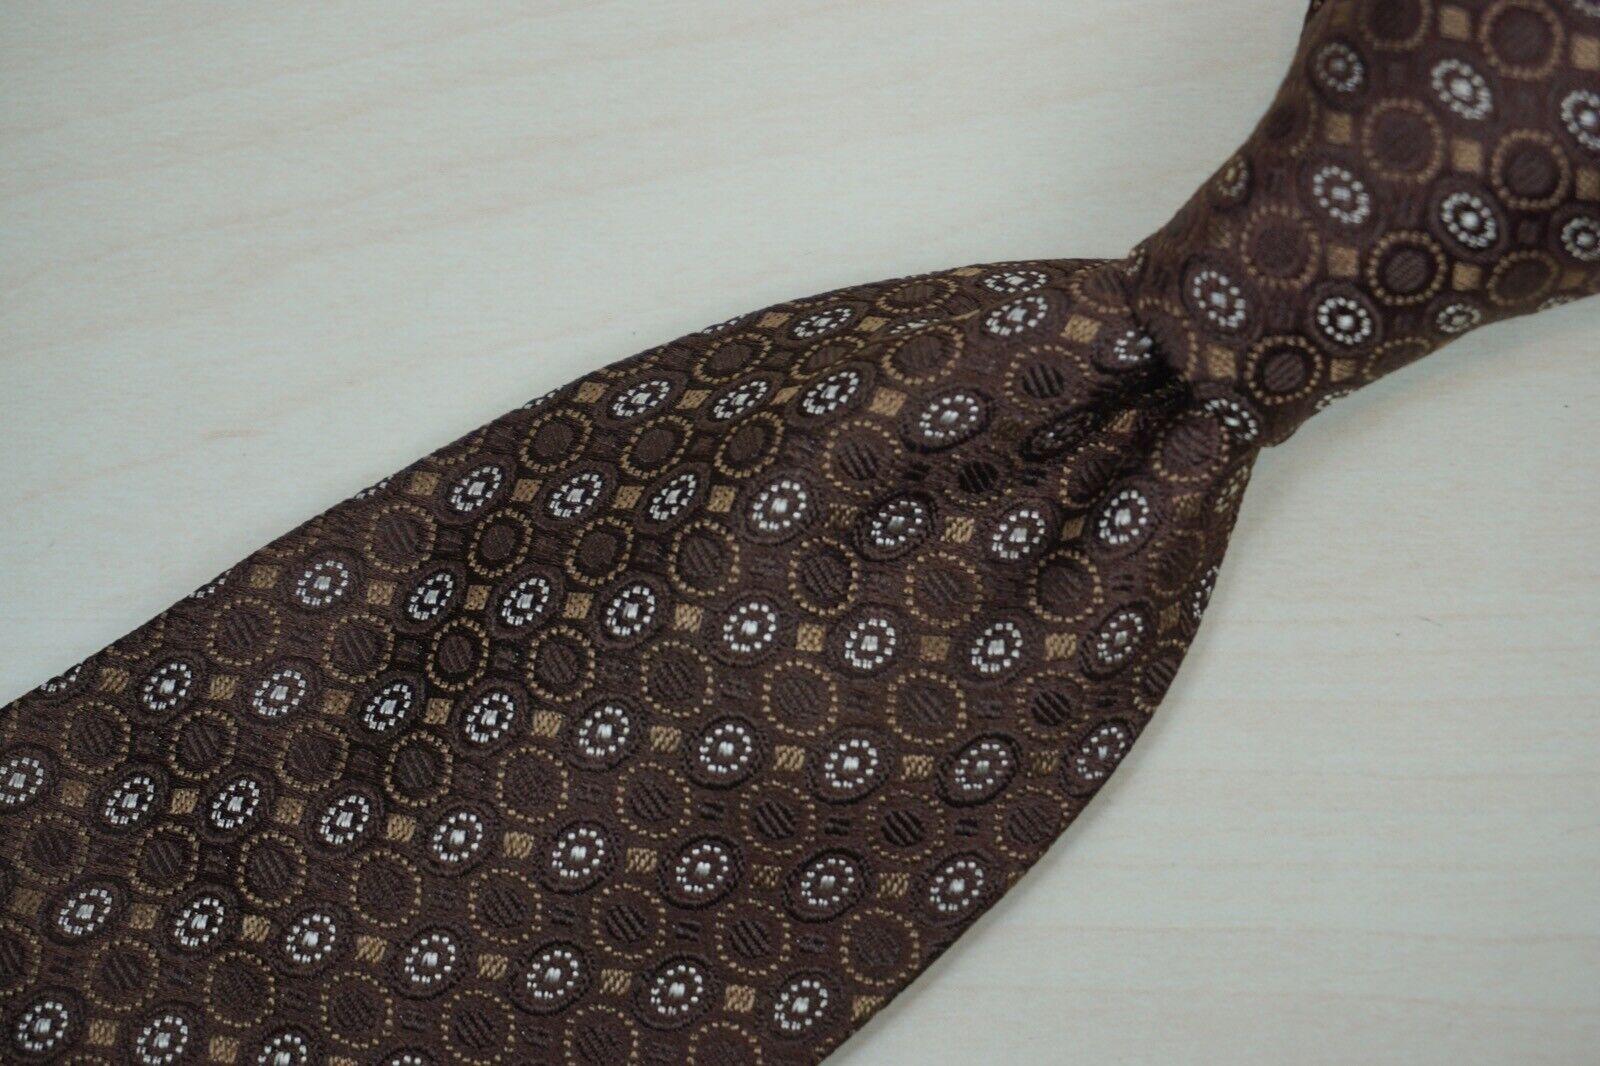 A. Sulka & Firma Brown Gewebt Geometrisch Seide Vintage Krawatte